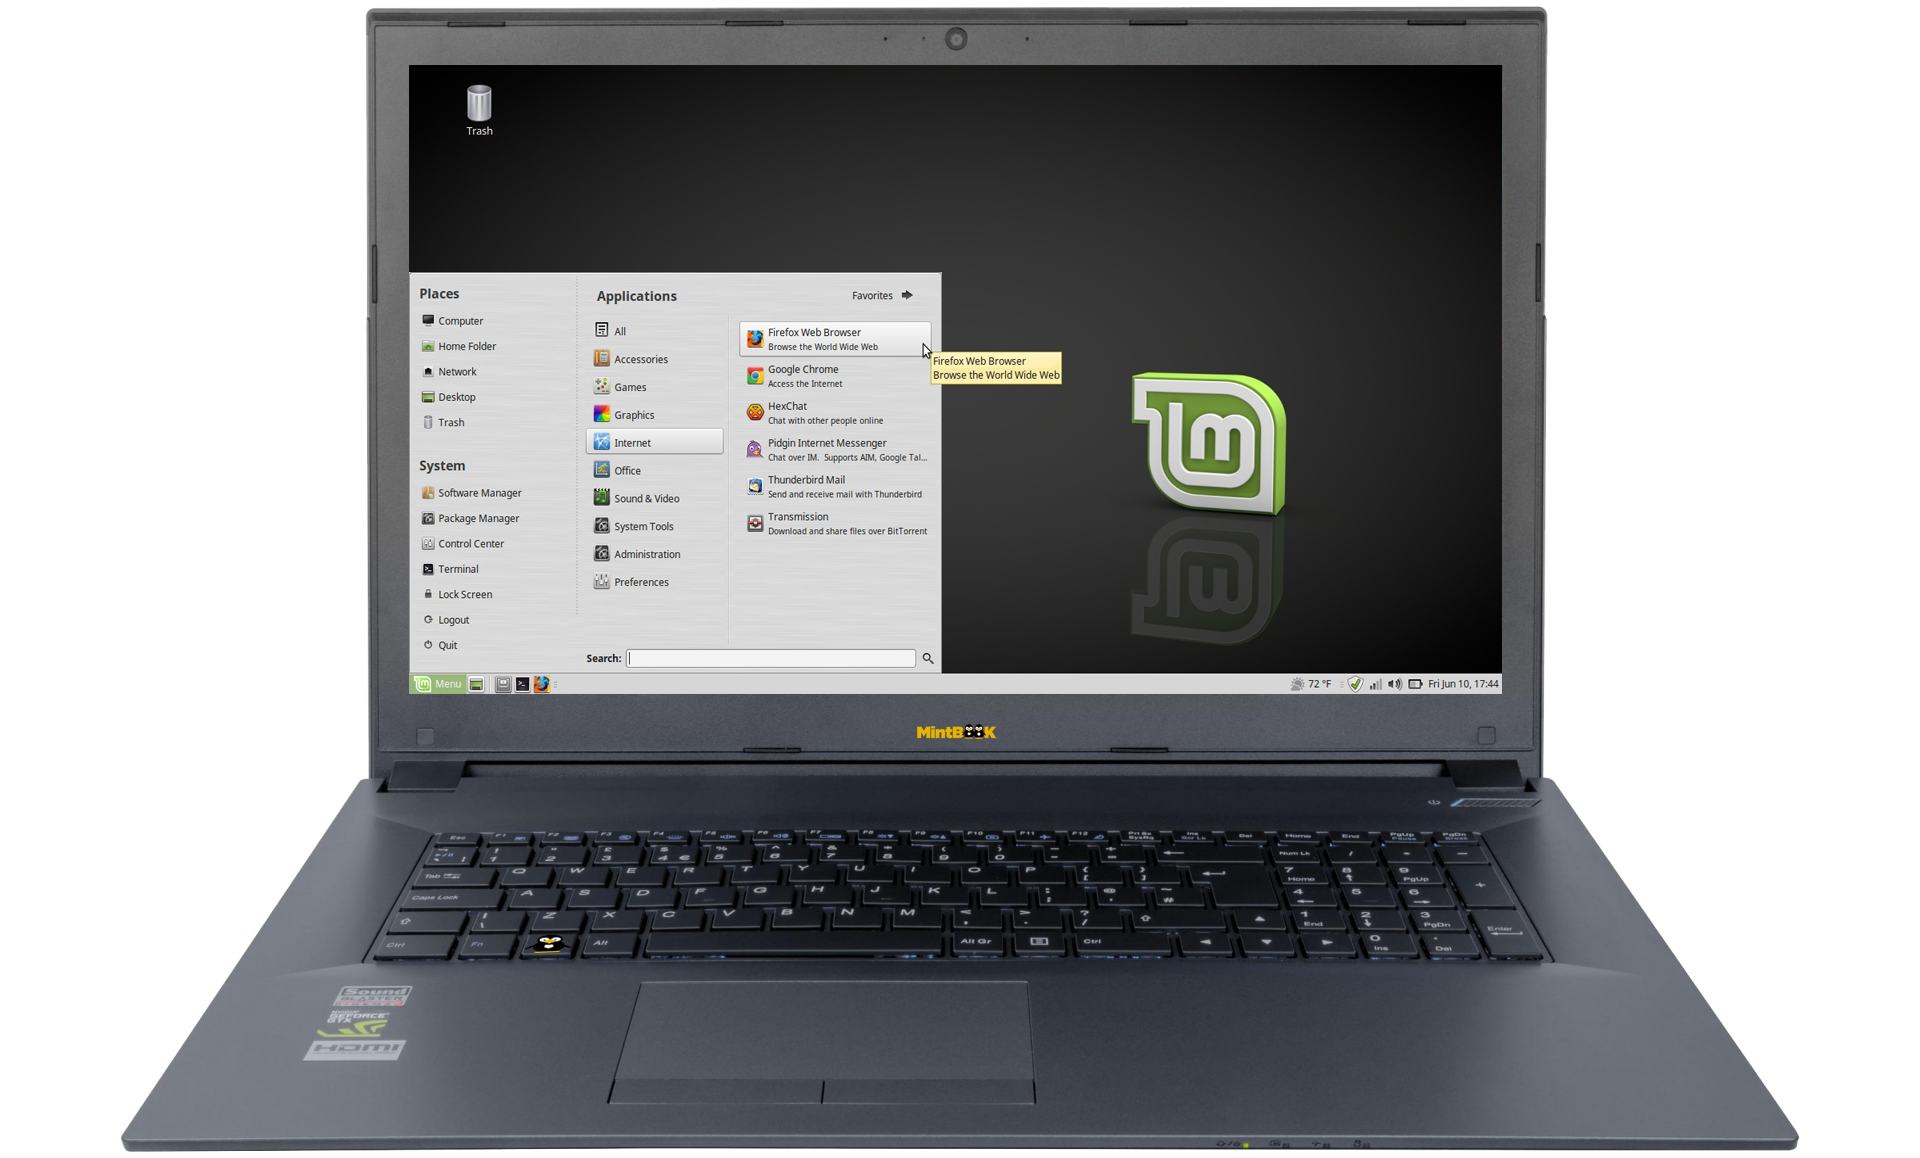 Linux-Mint NoteBook 17.3